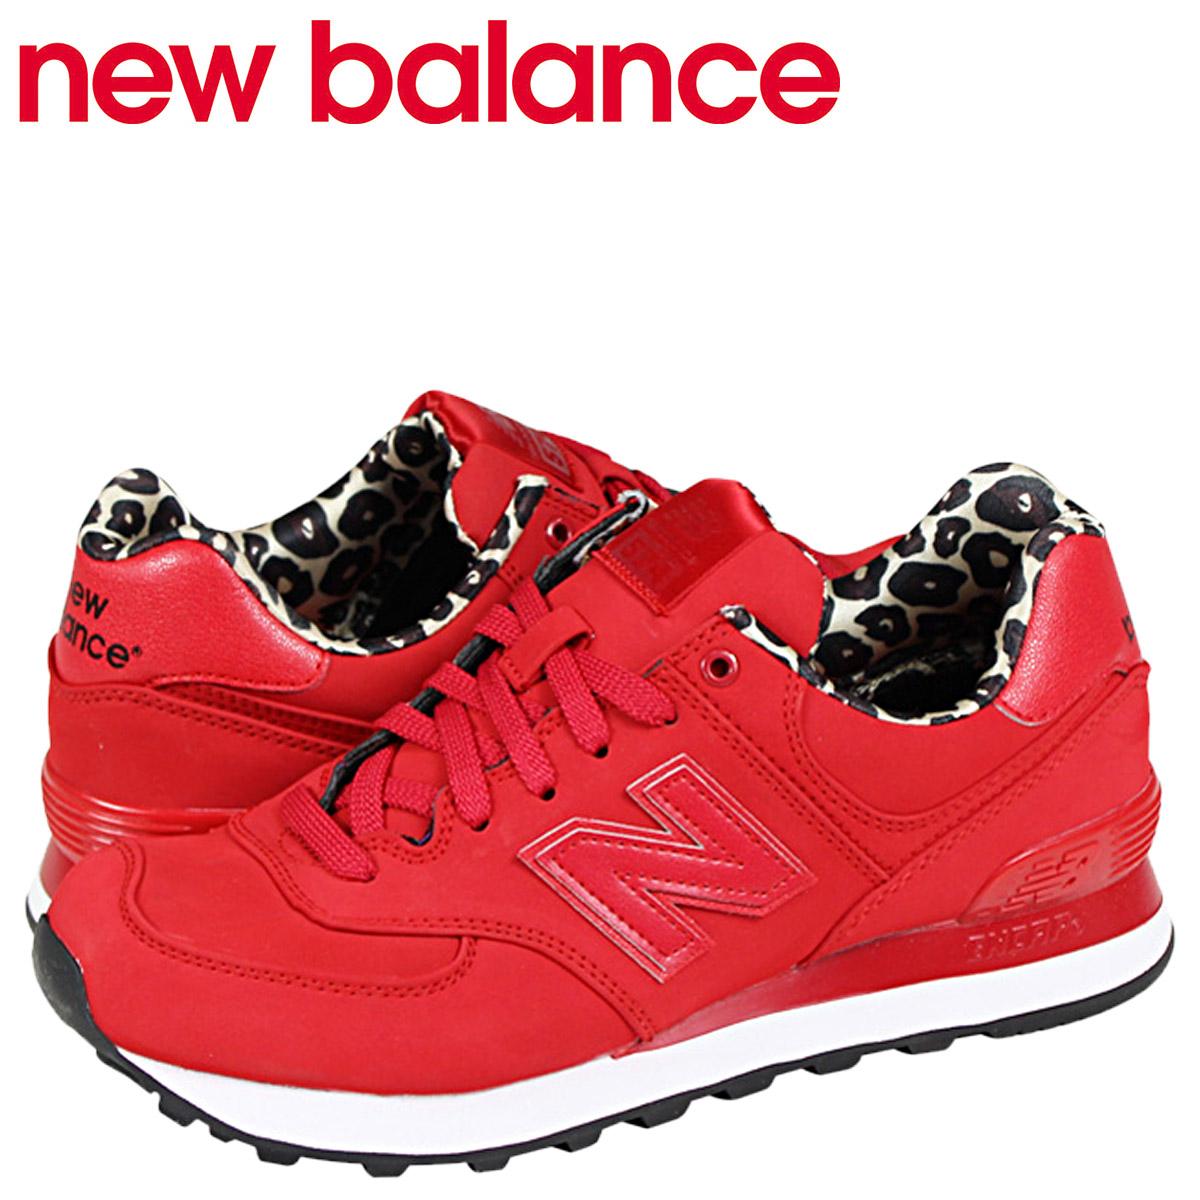 new balance 574 red nubuck